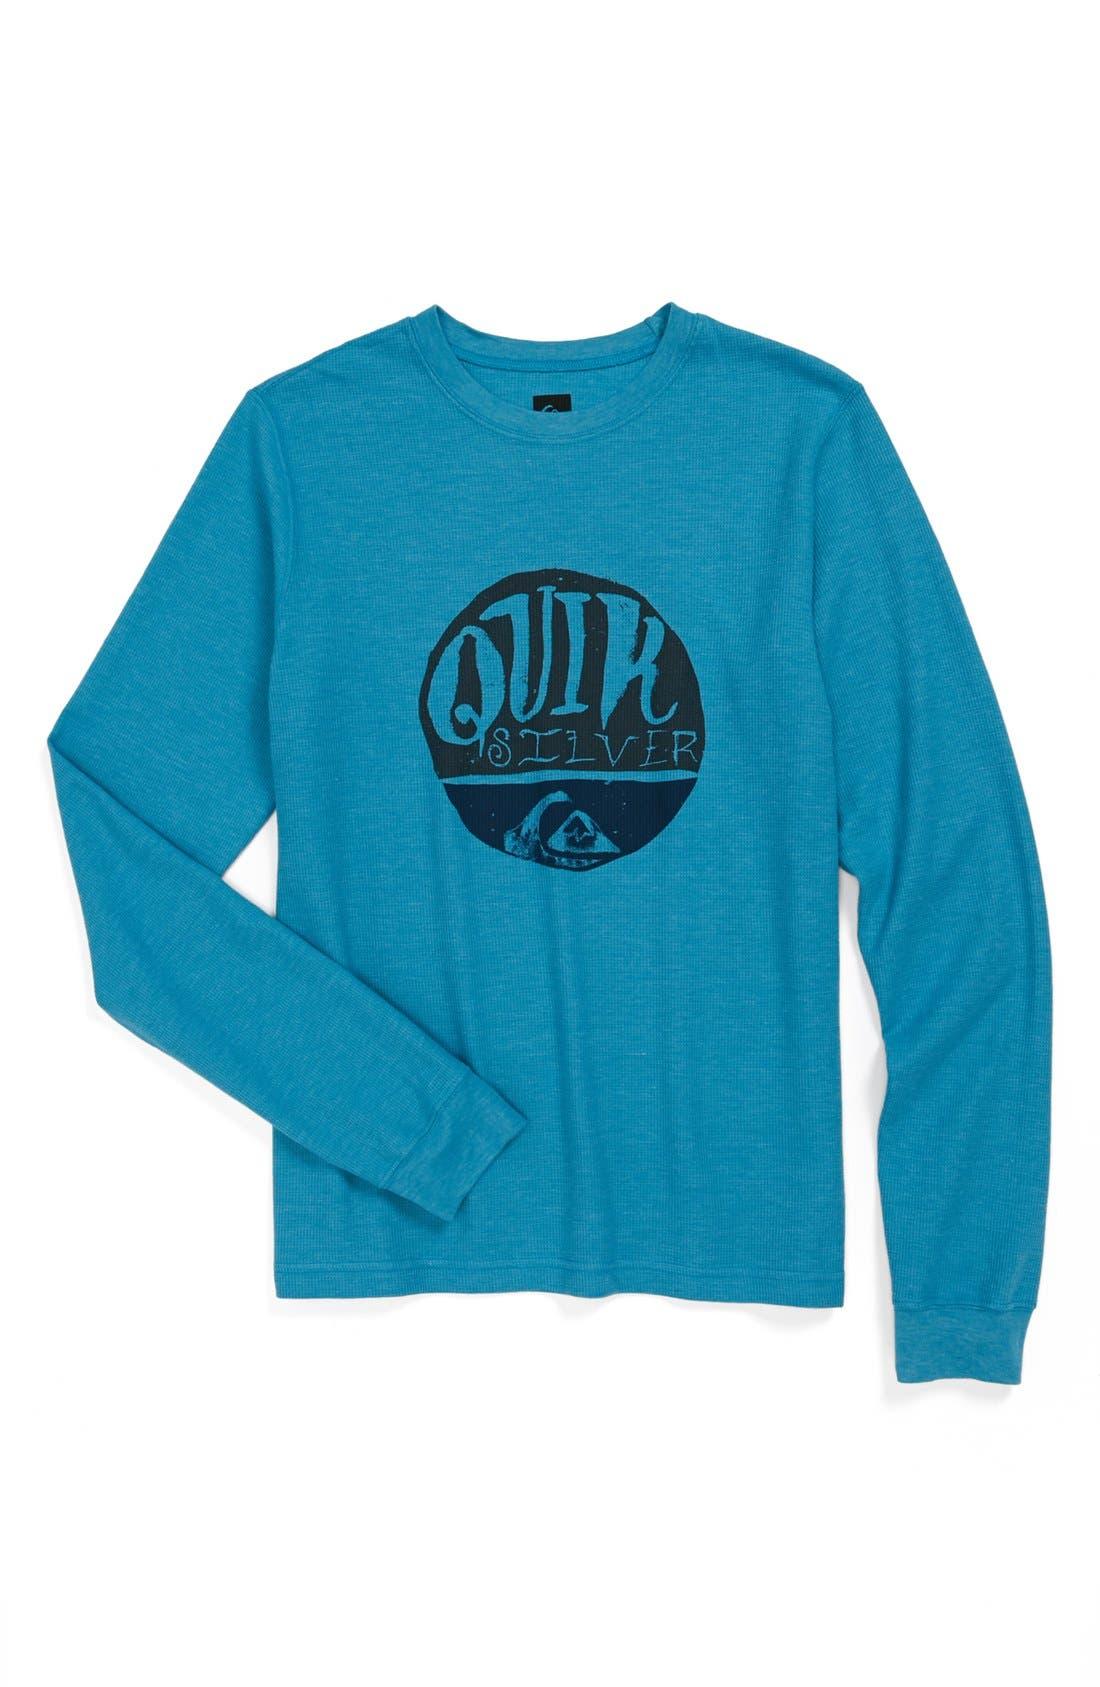 Alternate Image 1 Selected - Quiksilver 'Sunrise' Long Sleeve Thermal Shirt (Big Boys)